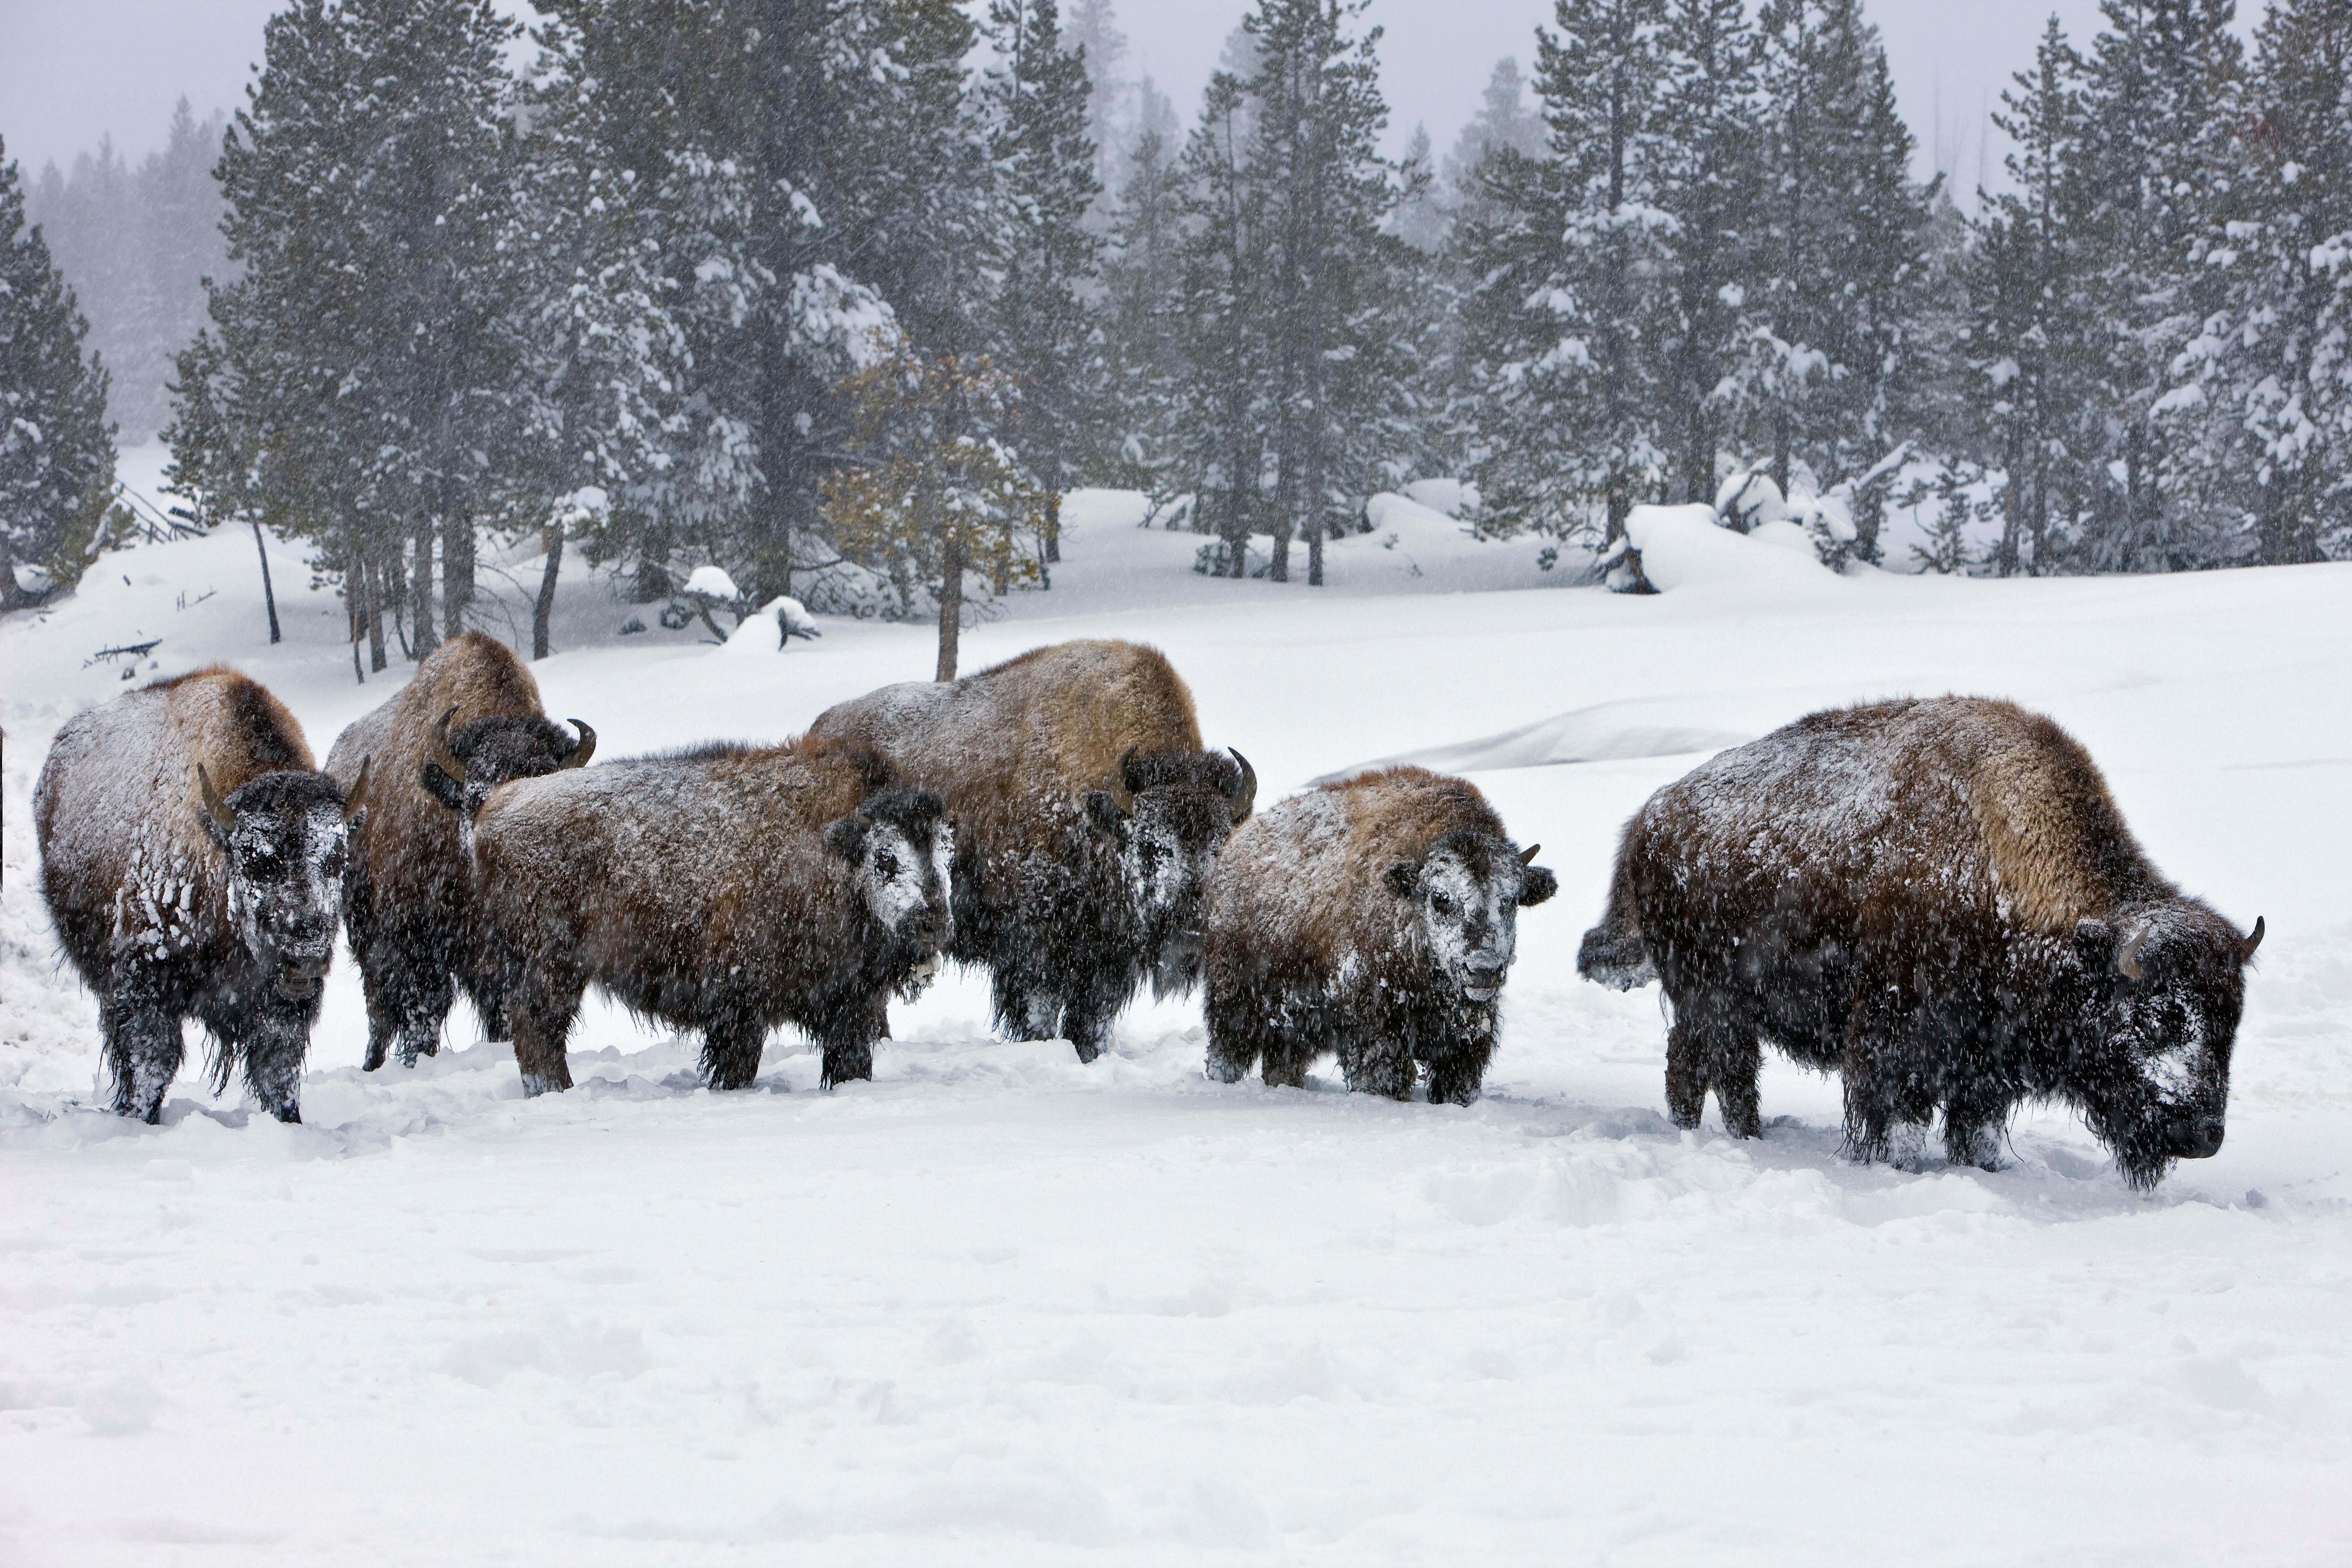 Buffalo wintering in the Upper Geyser Basin. Yellowstone National Park, Wyoming. Jeff Vanuga Photo.